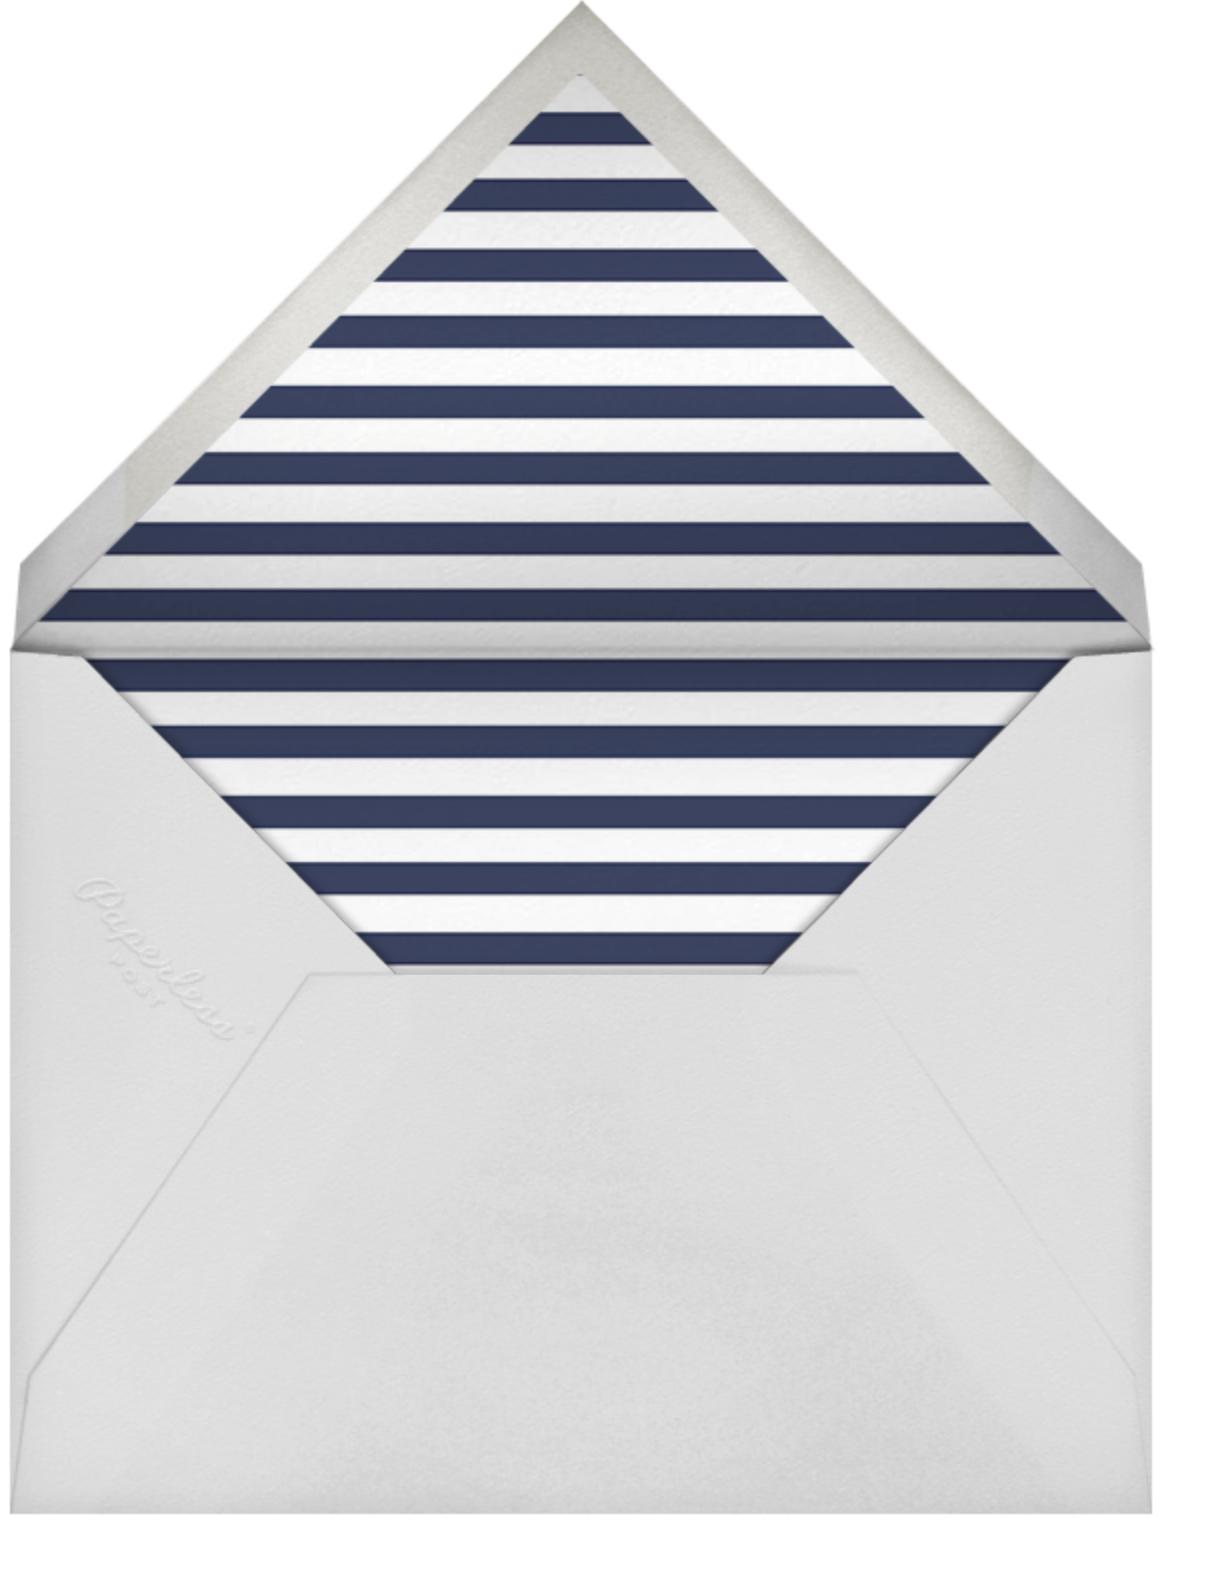 Confetti (Horizontal Invitation) - Navy/Silver - kate spade new york - All - envelope back